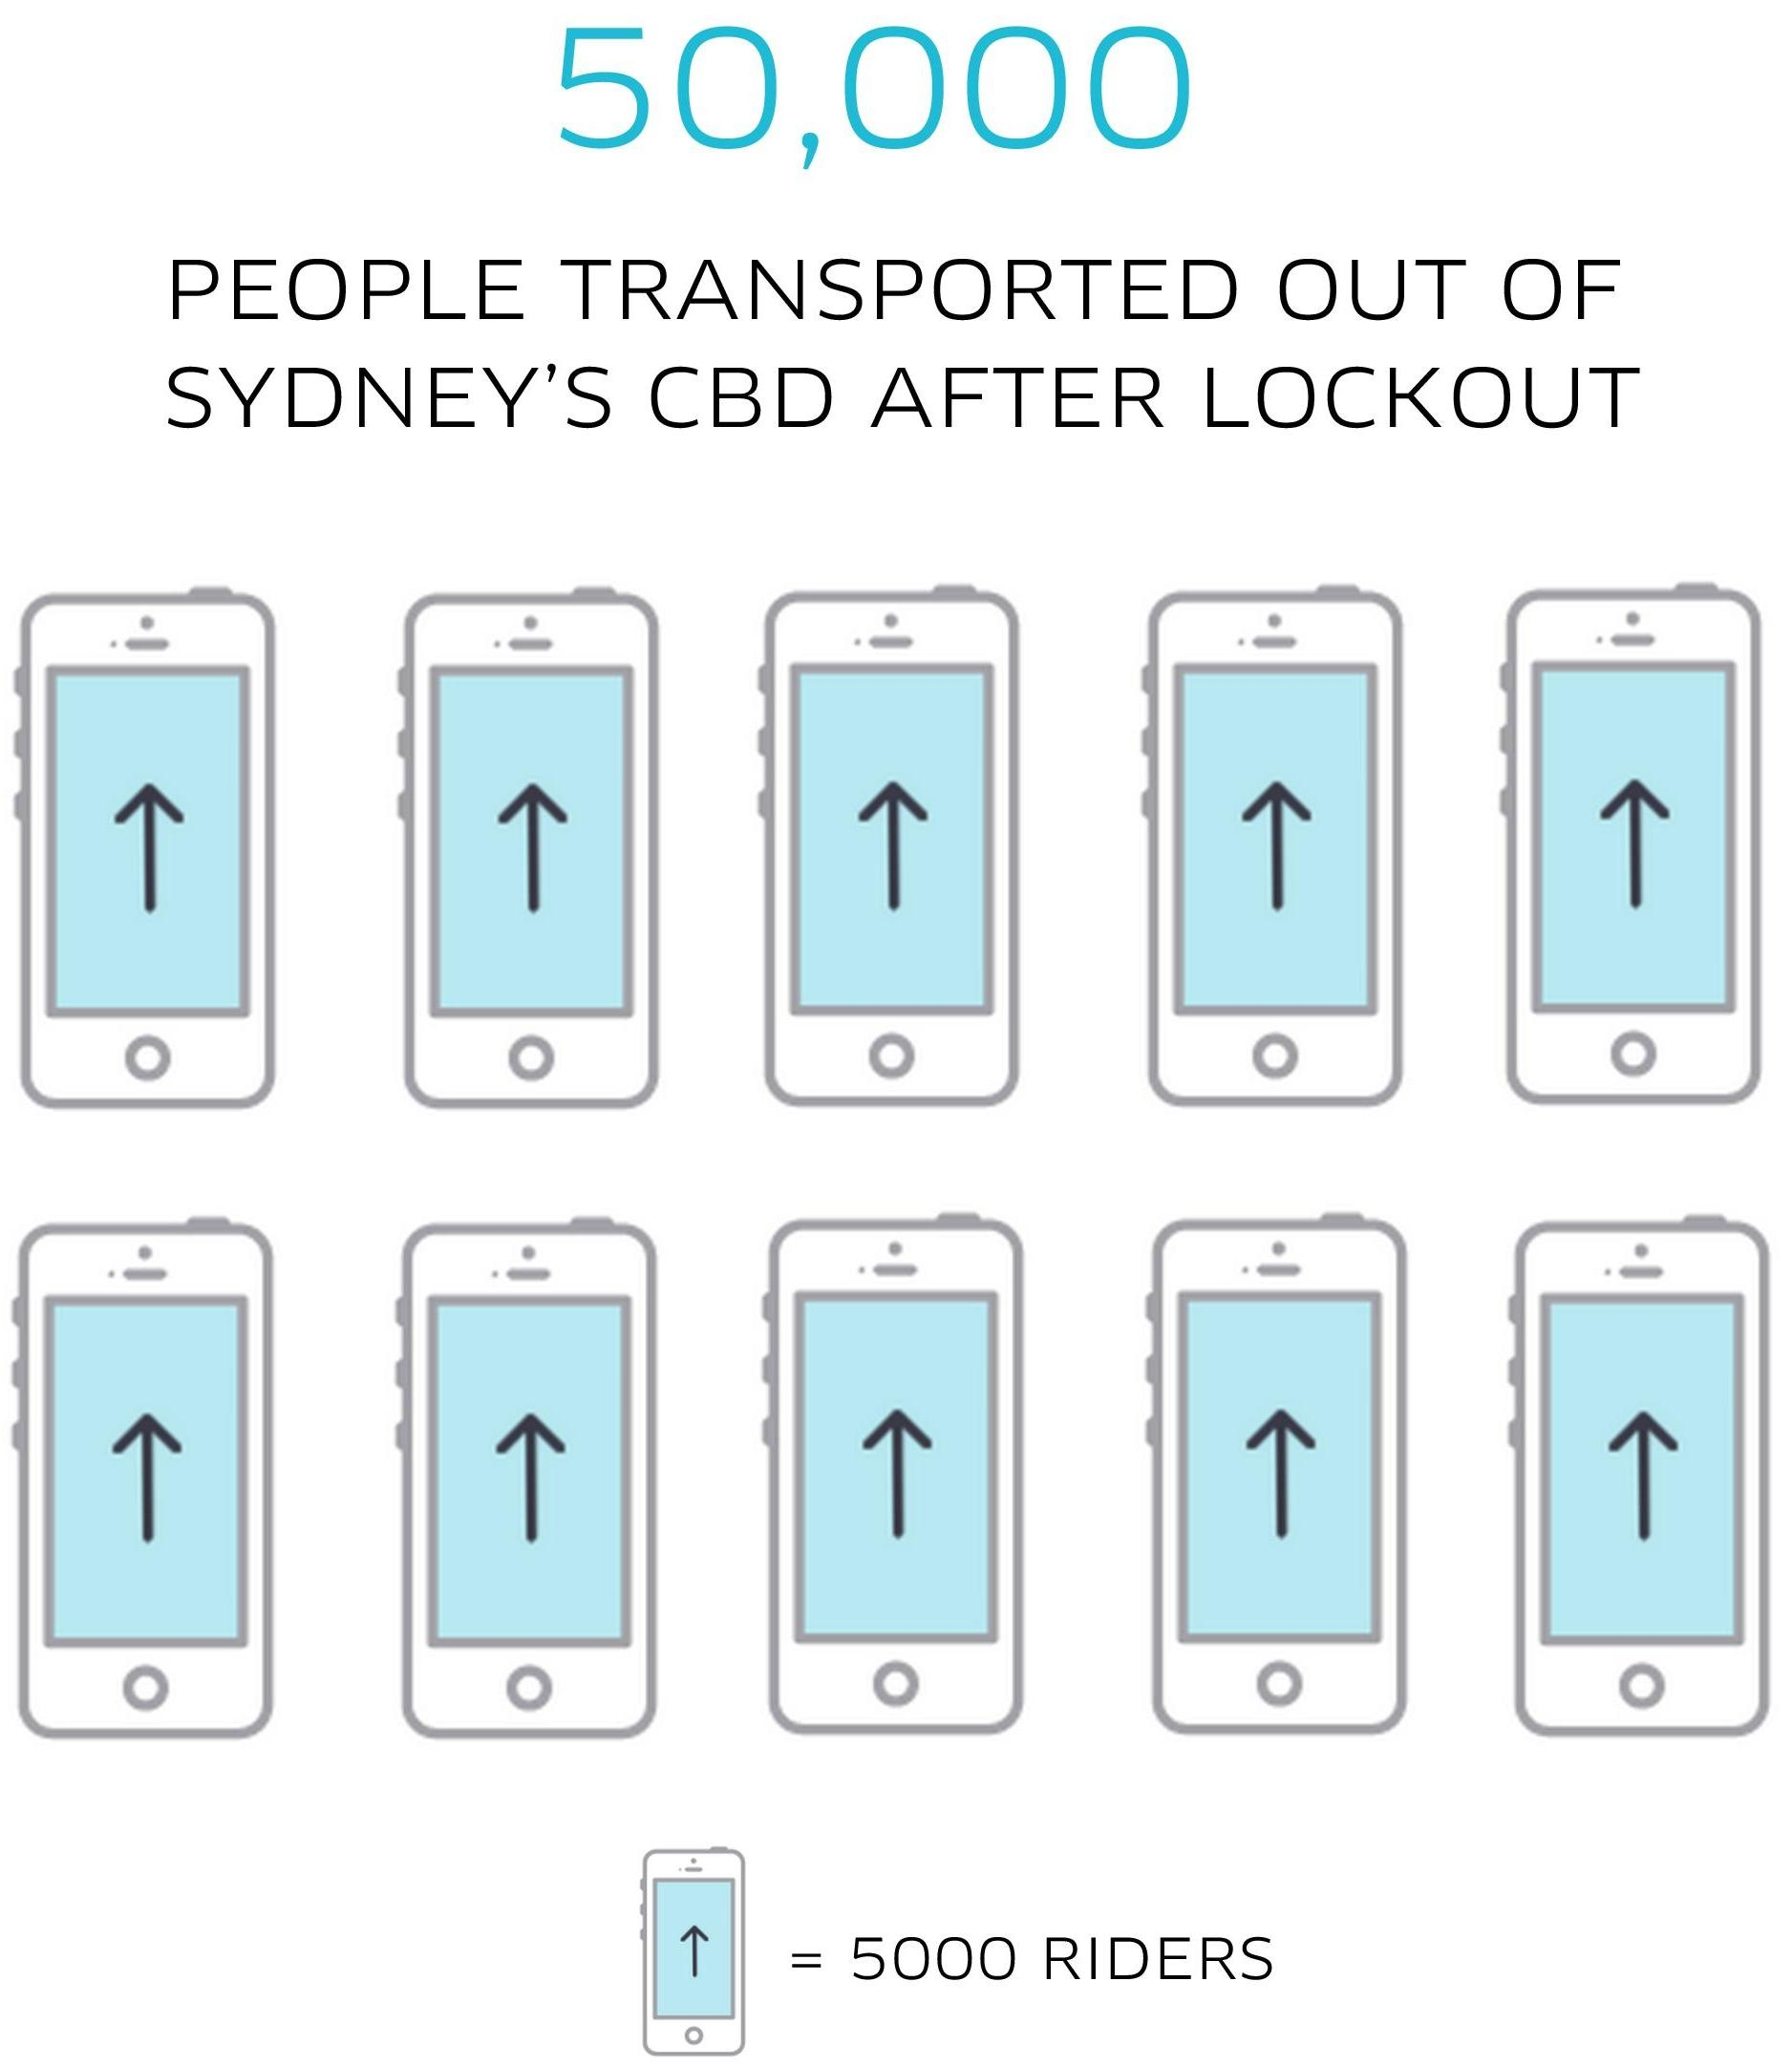 Lockout Rides